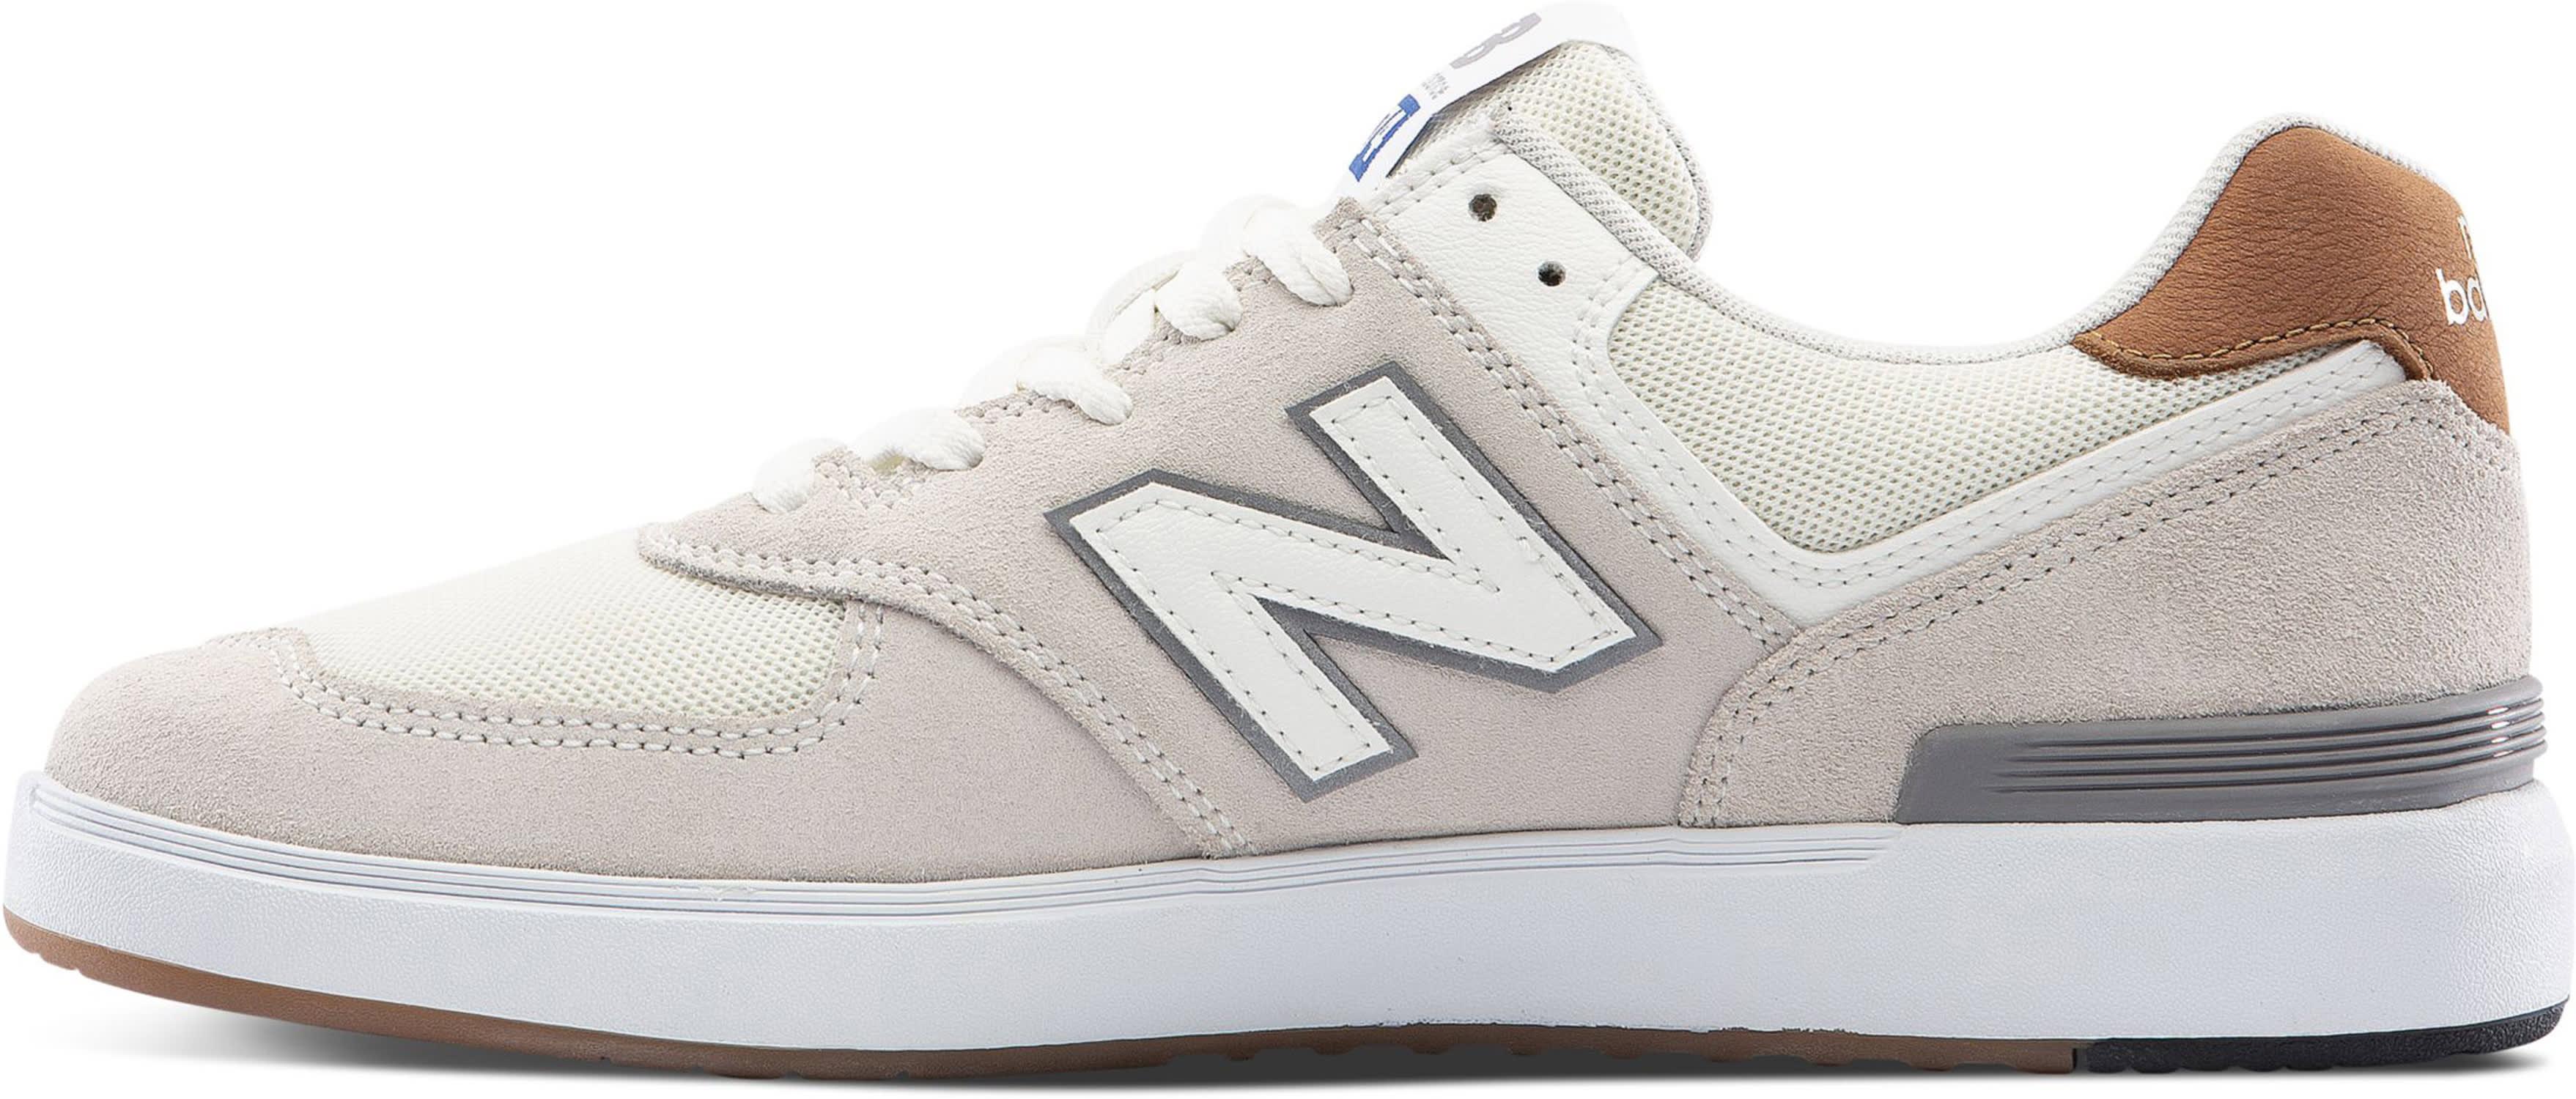 New Balance 574 Melbourne Skate Shoes